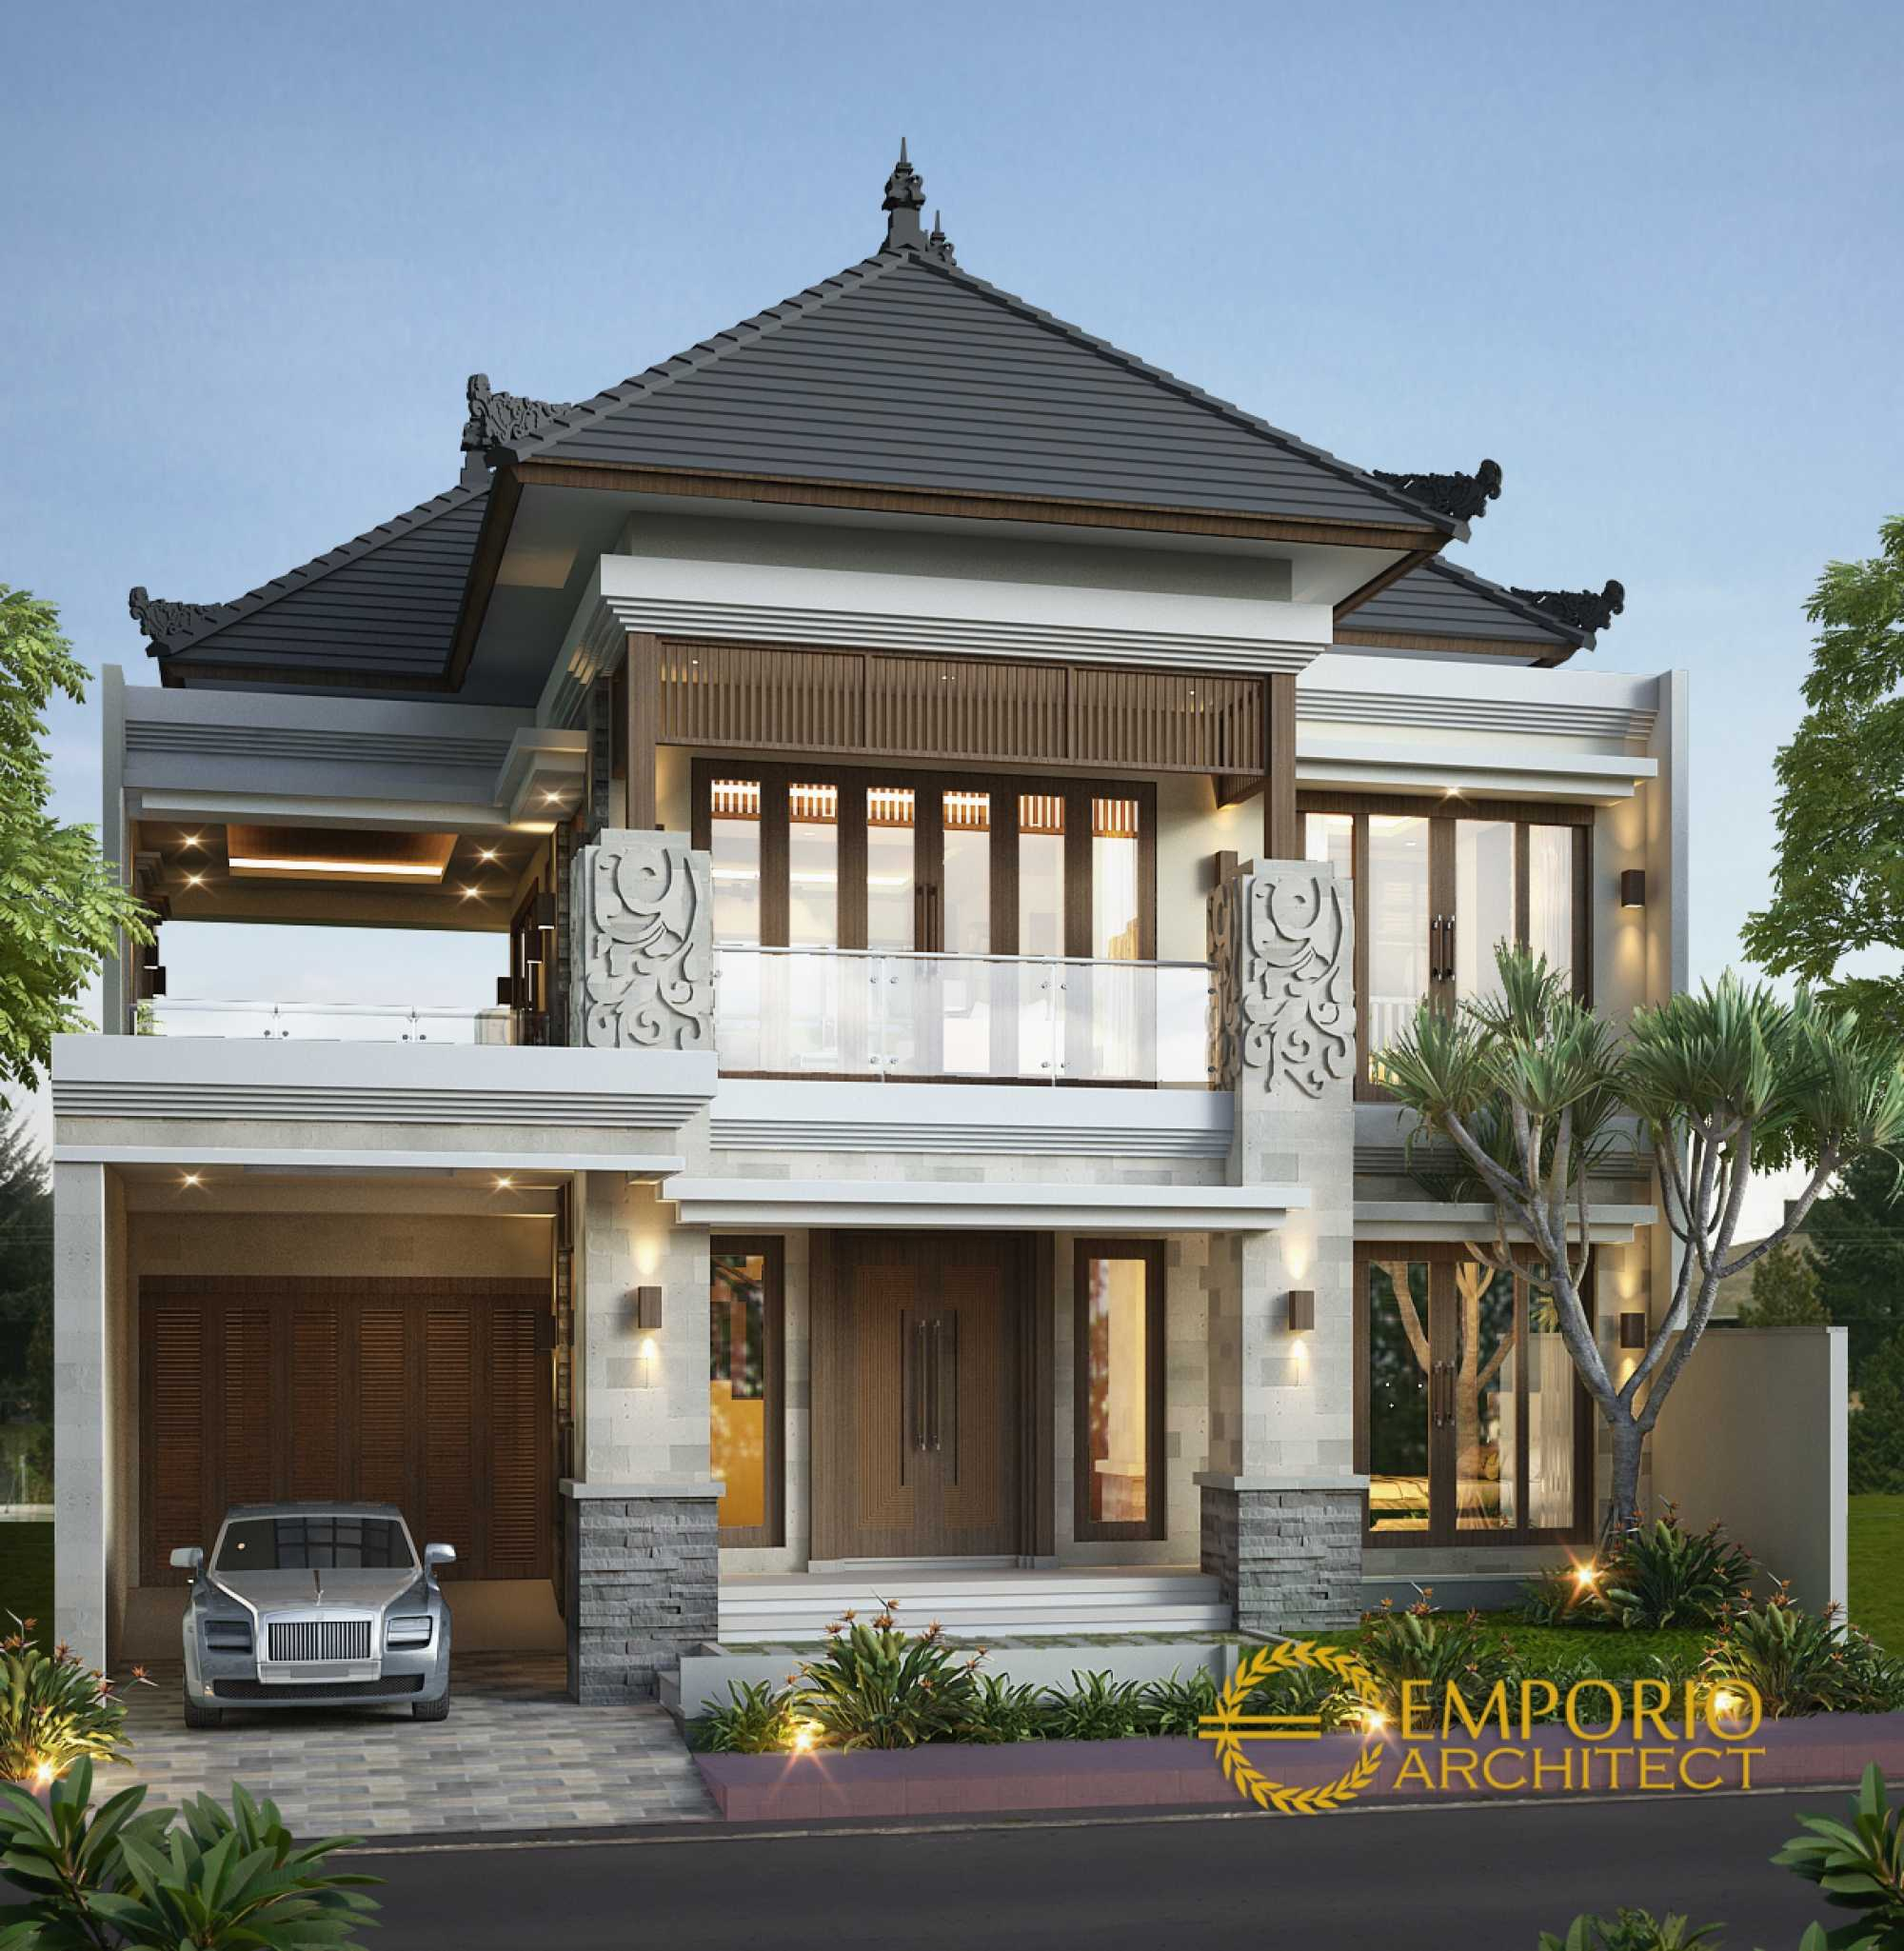 Photo Emporio Architect Desain Rumah Villa Bali Tropis 430 Kuta Bali Desain Rumah Villa Bali Tropis 430 Kuta Bali 3 Desain Arsitek Oleh Emporio Architect Arsitag